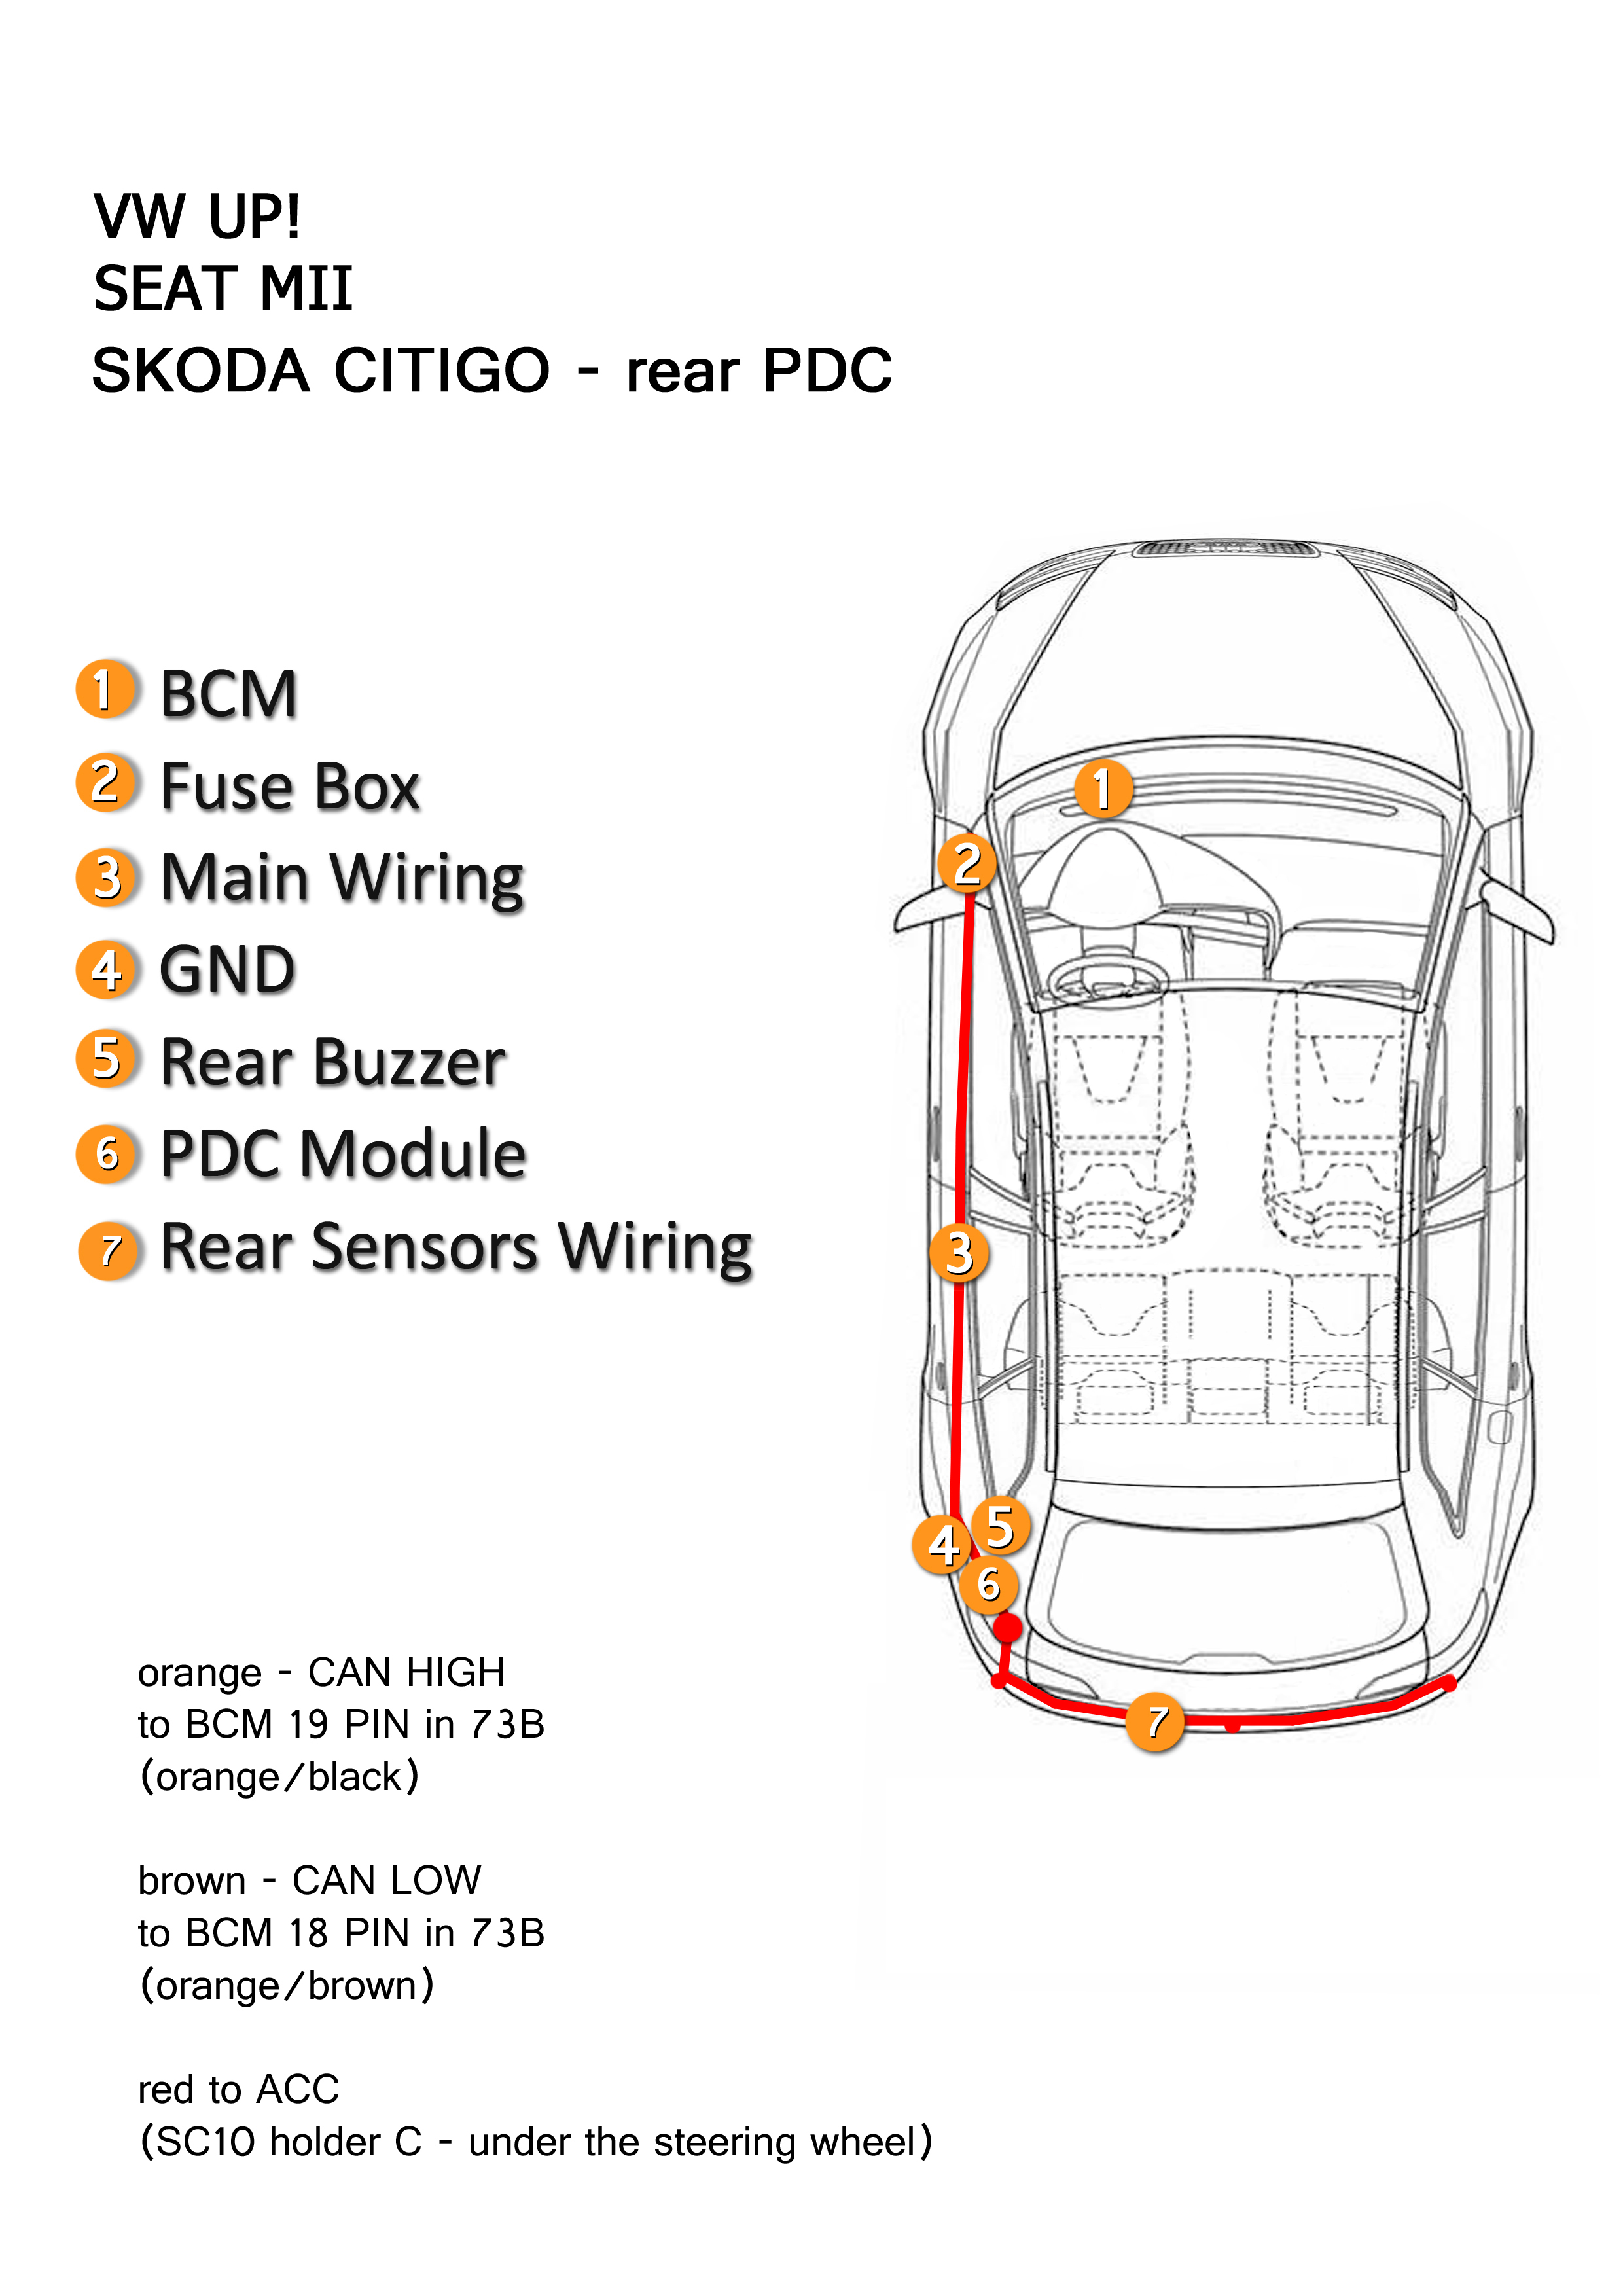 Vw Up Fuse Box Location Schematic Diagrams Volkswagen Wiring Diagram Pdc Seat Mii Skoda Citigo 2000 F150